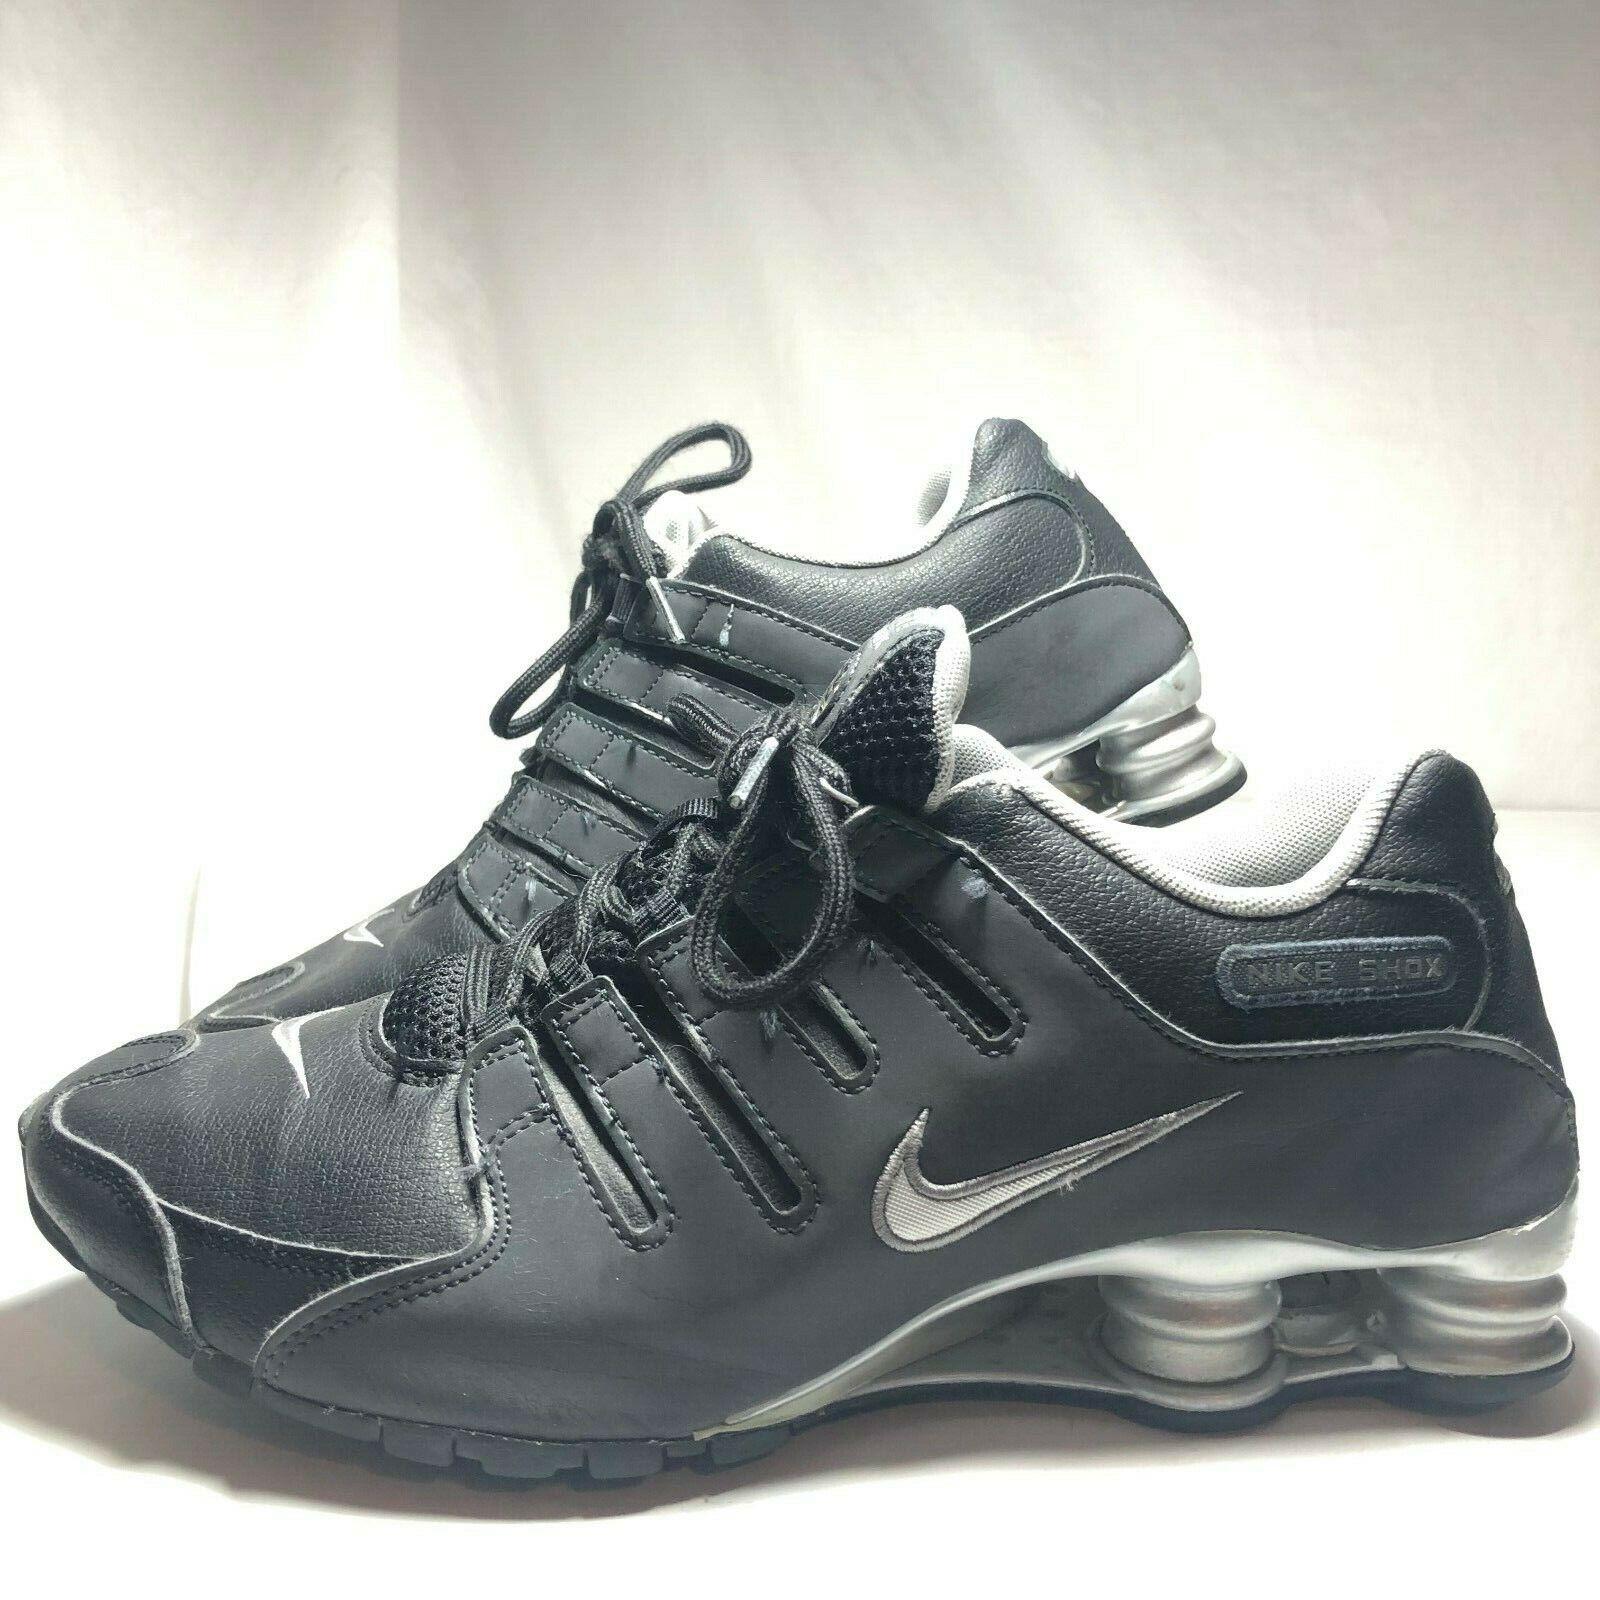 9.5 Größe männer's Premium Turbo Shox Nike Schuhe NZ 024